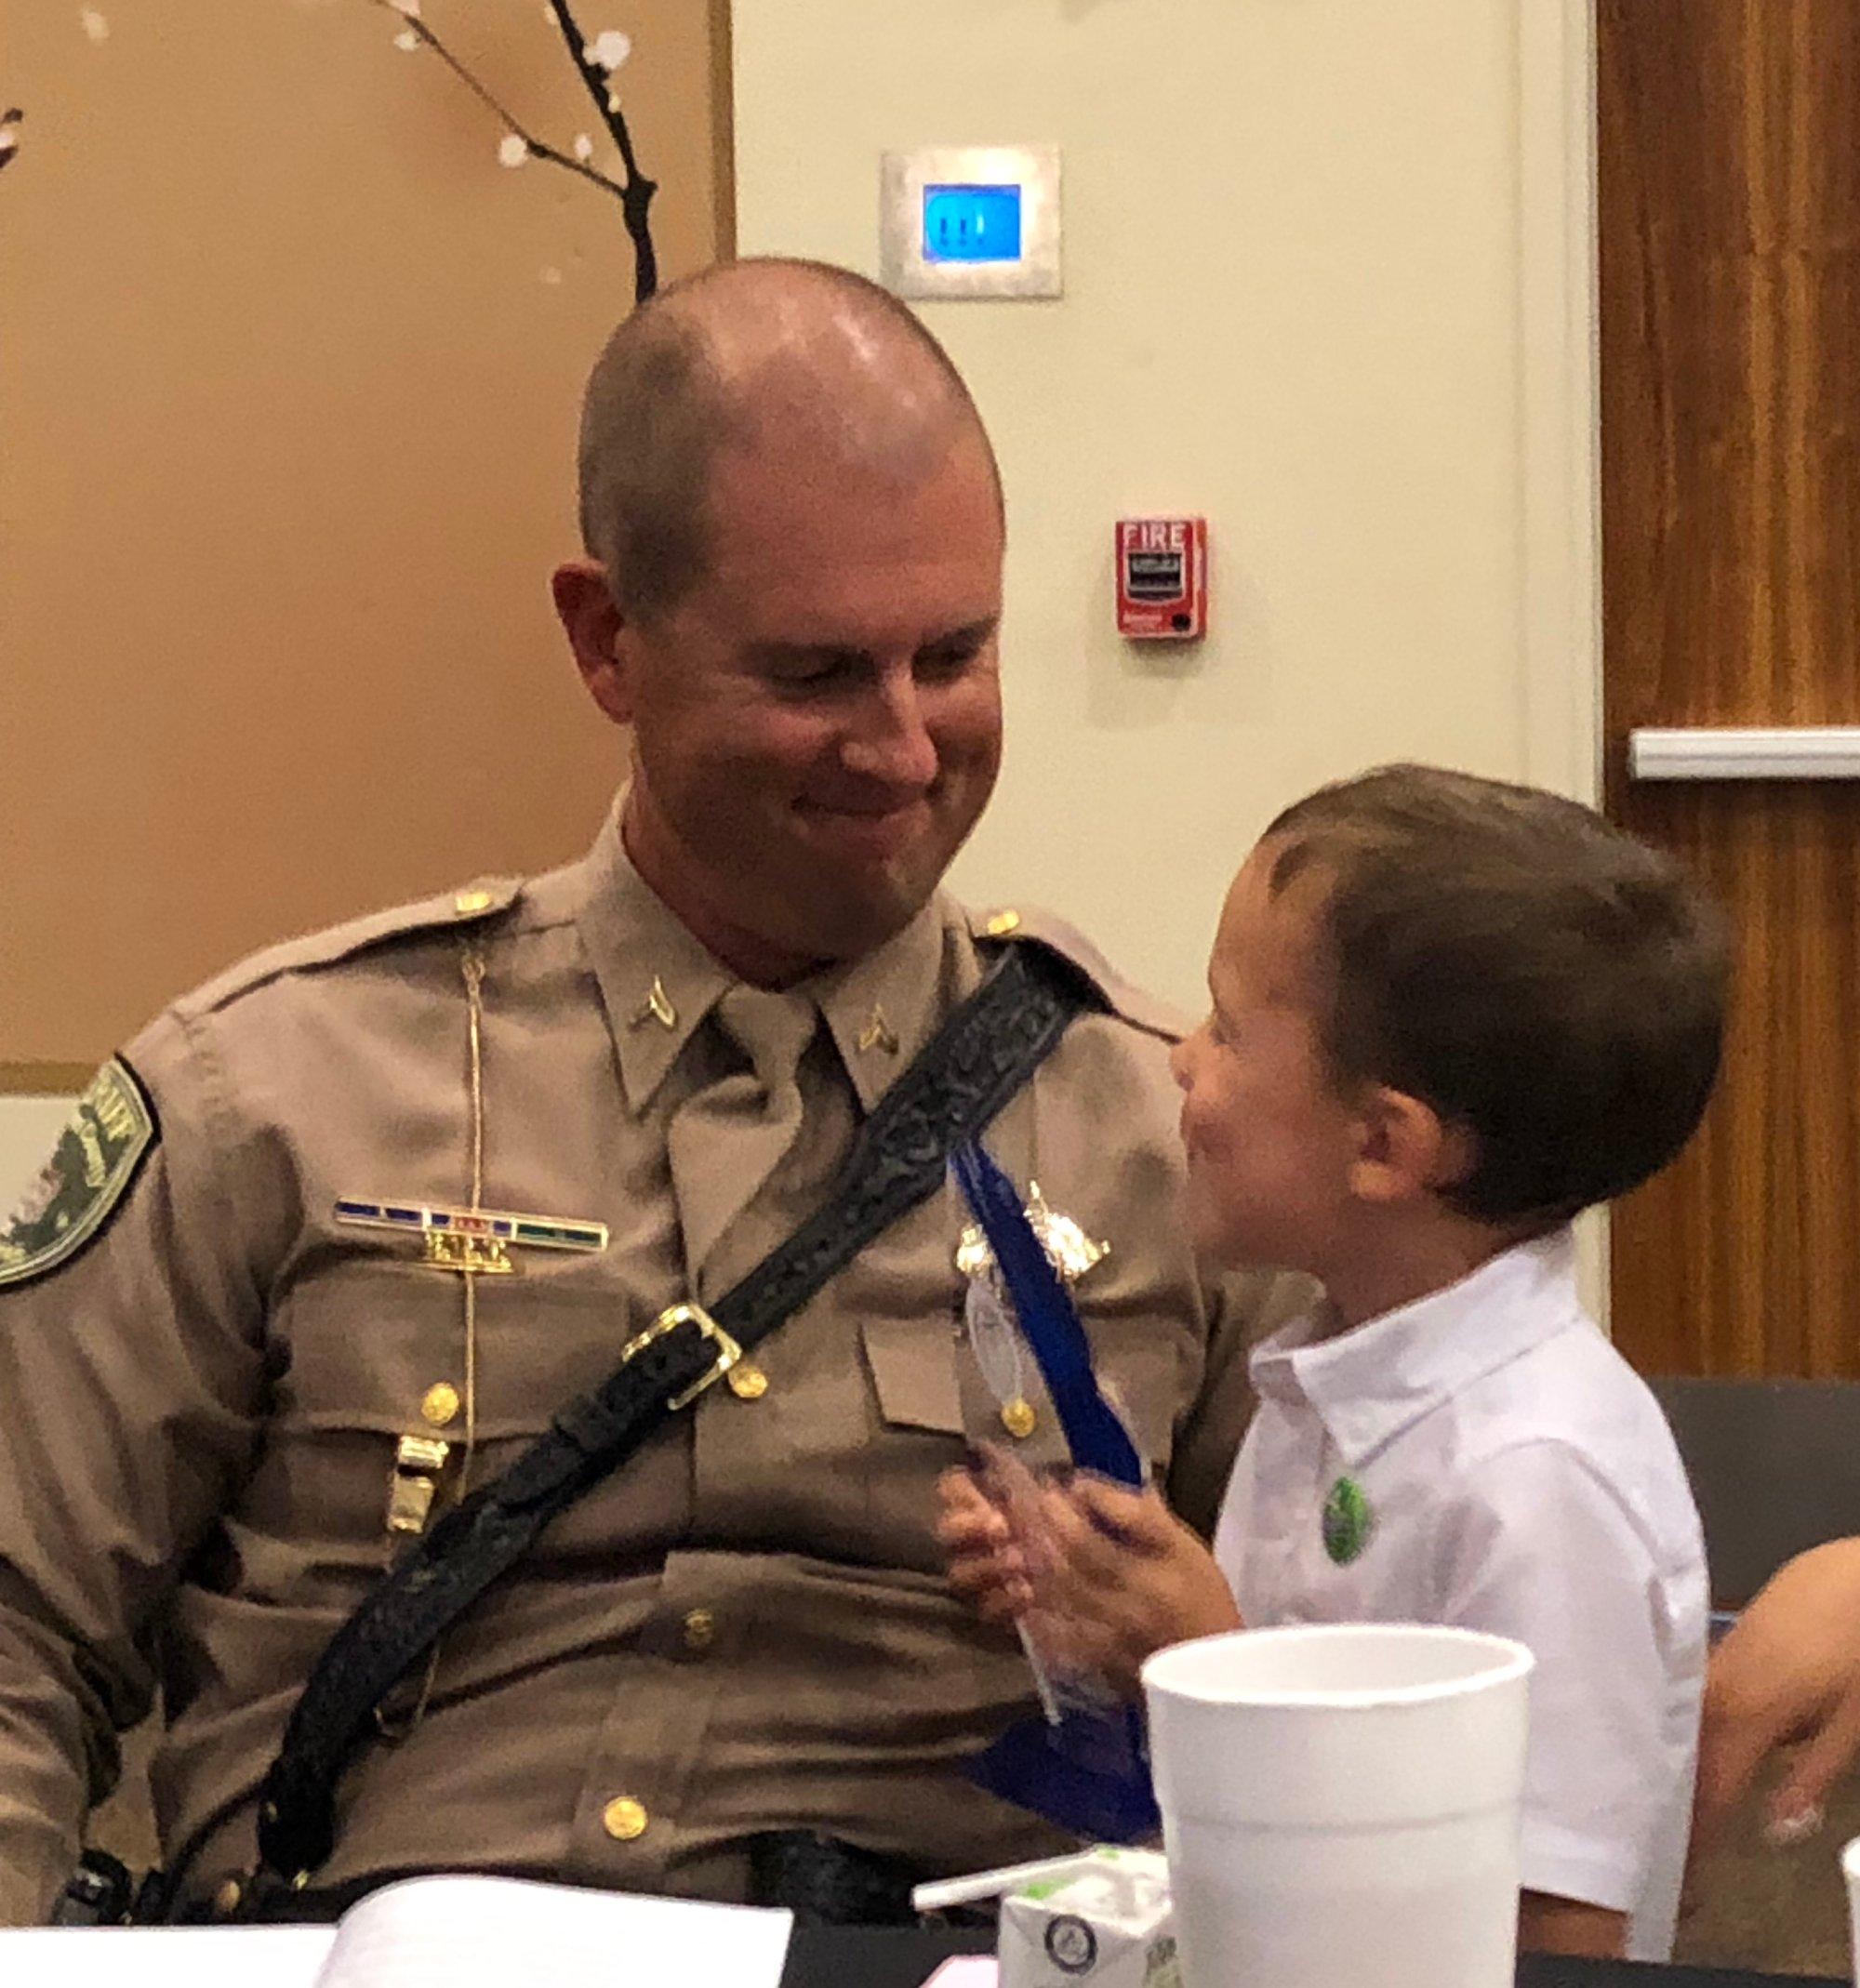 Courtesy of the Washington County Sheriff's Office.